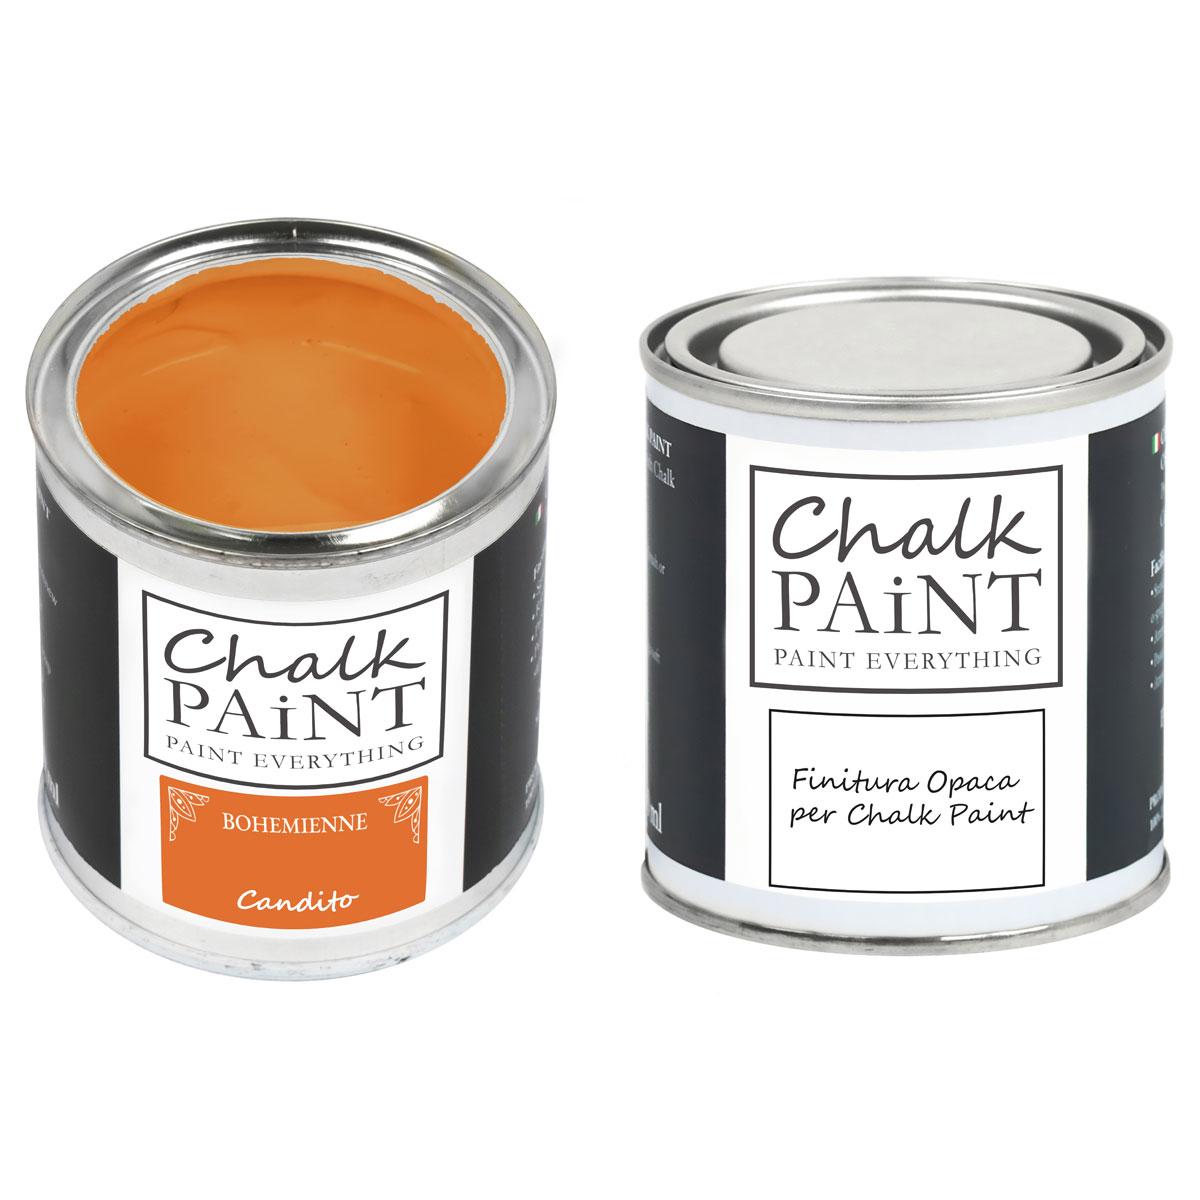 Chalk Paint Candito paint magic